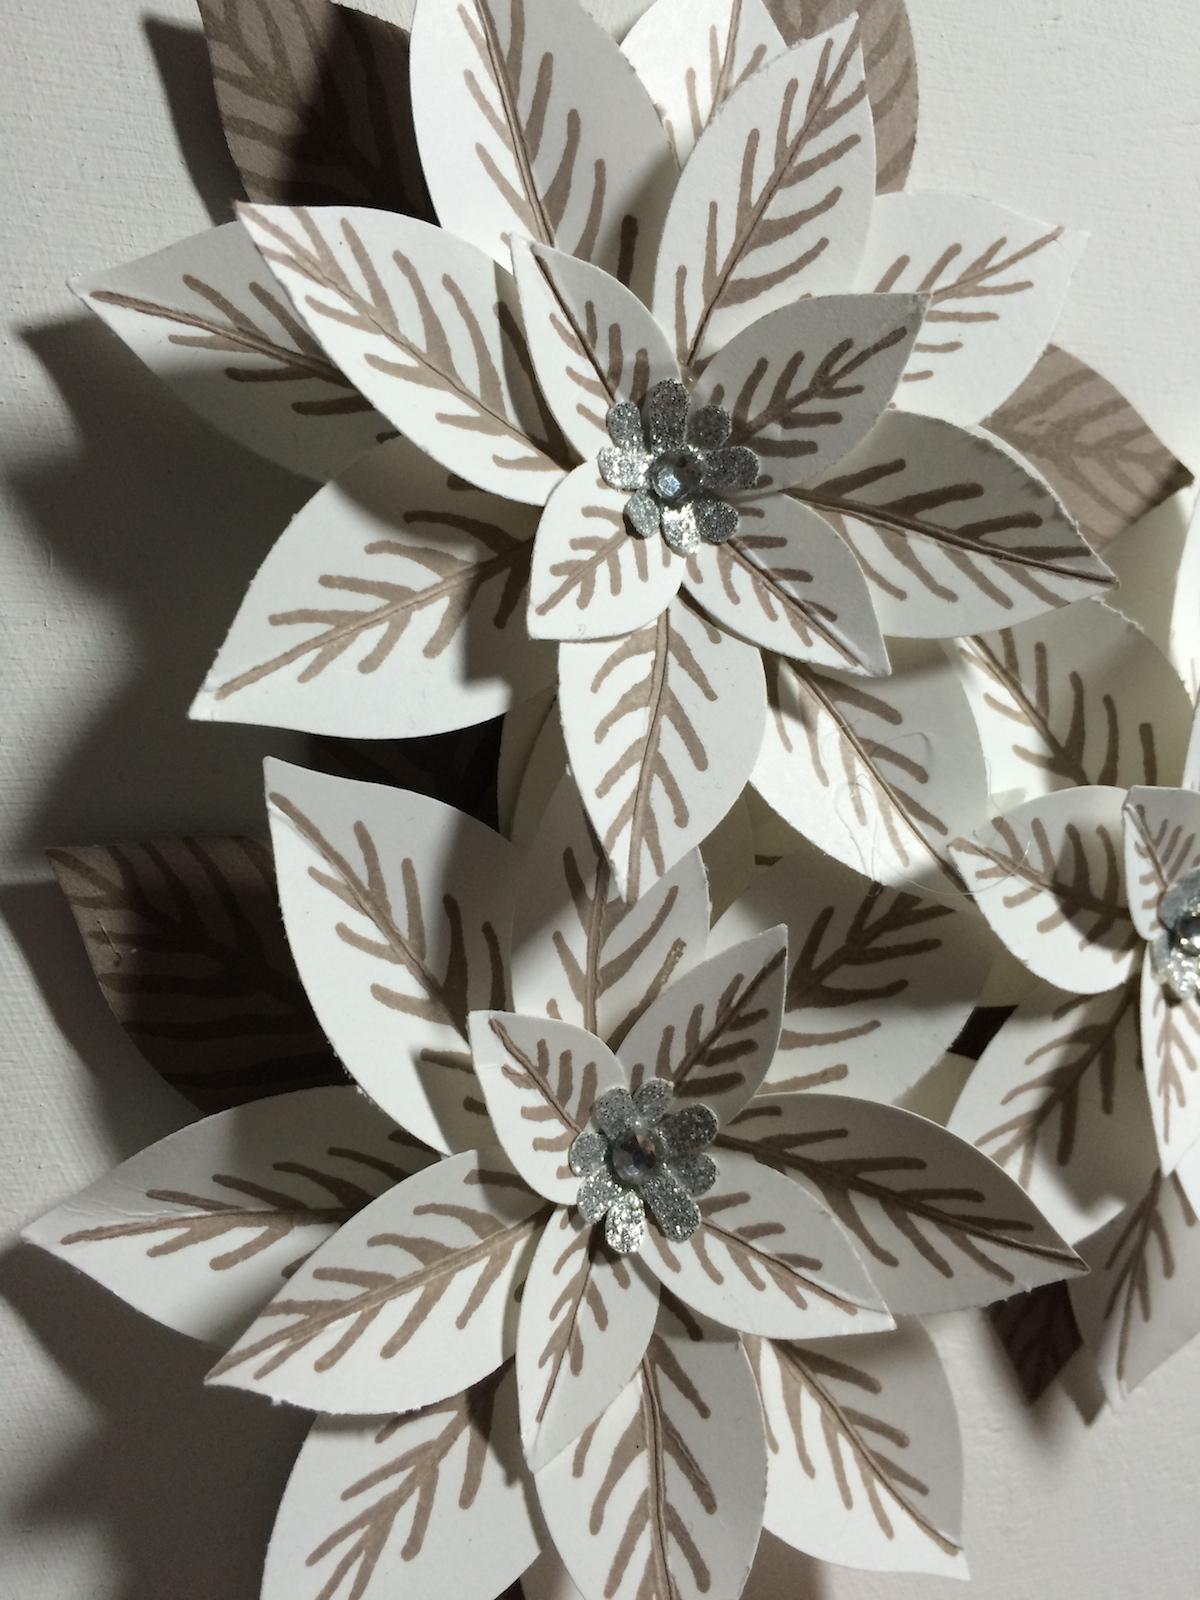 Stampin´UP!, Festliche Blüte, Festive Flower, Tip Top Taupe,2